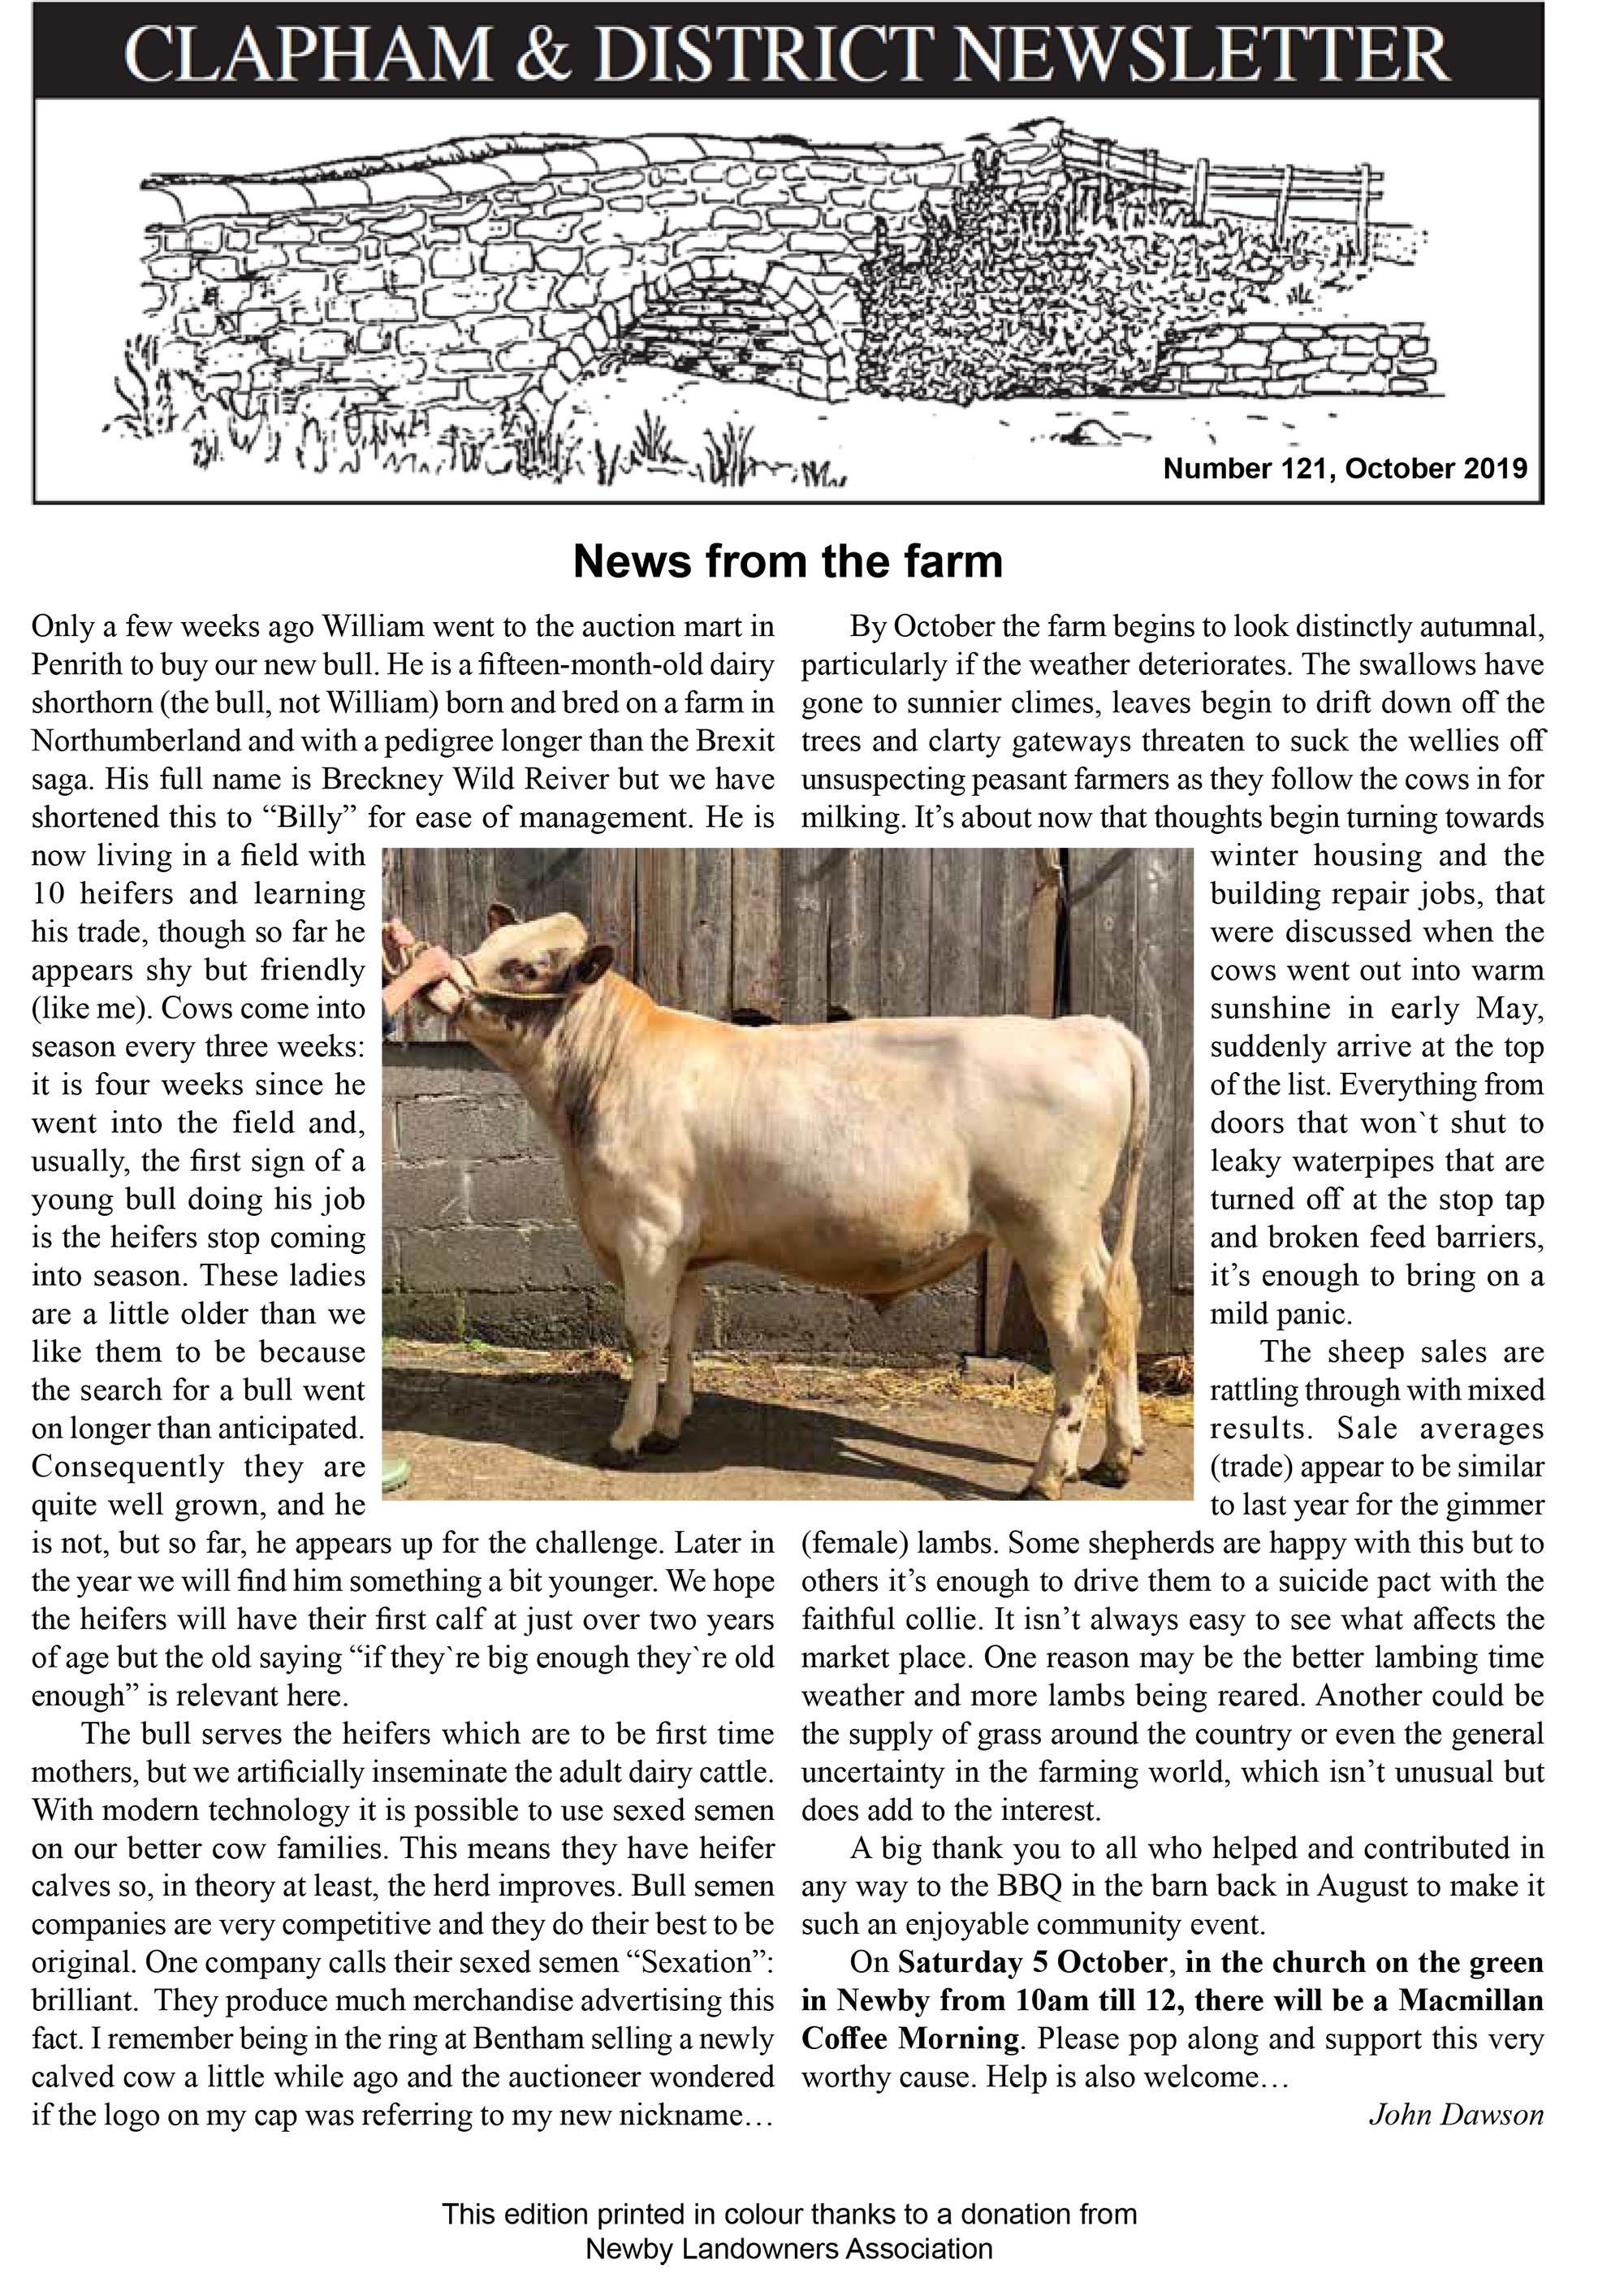 clapham-newsletter-121-october-2019-1